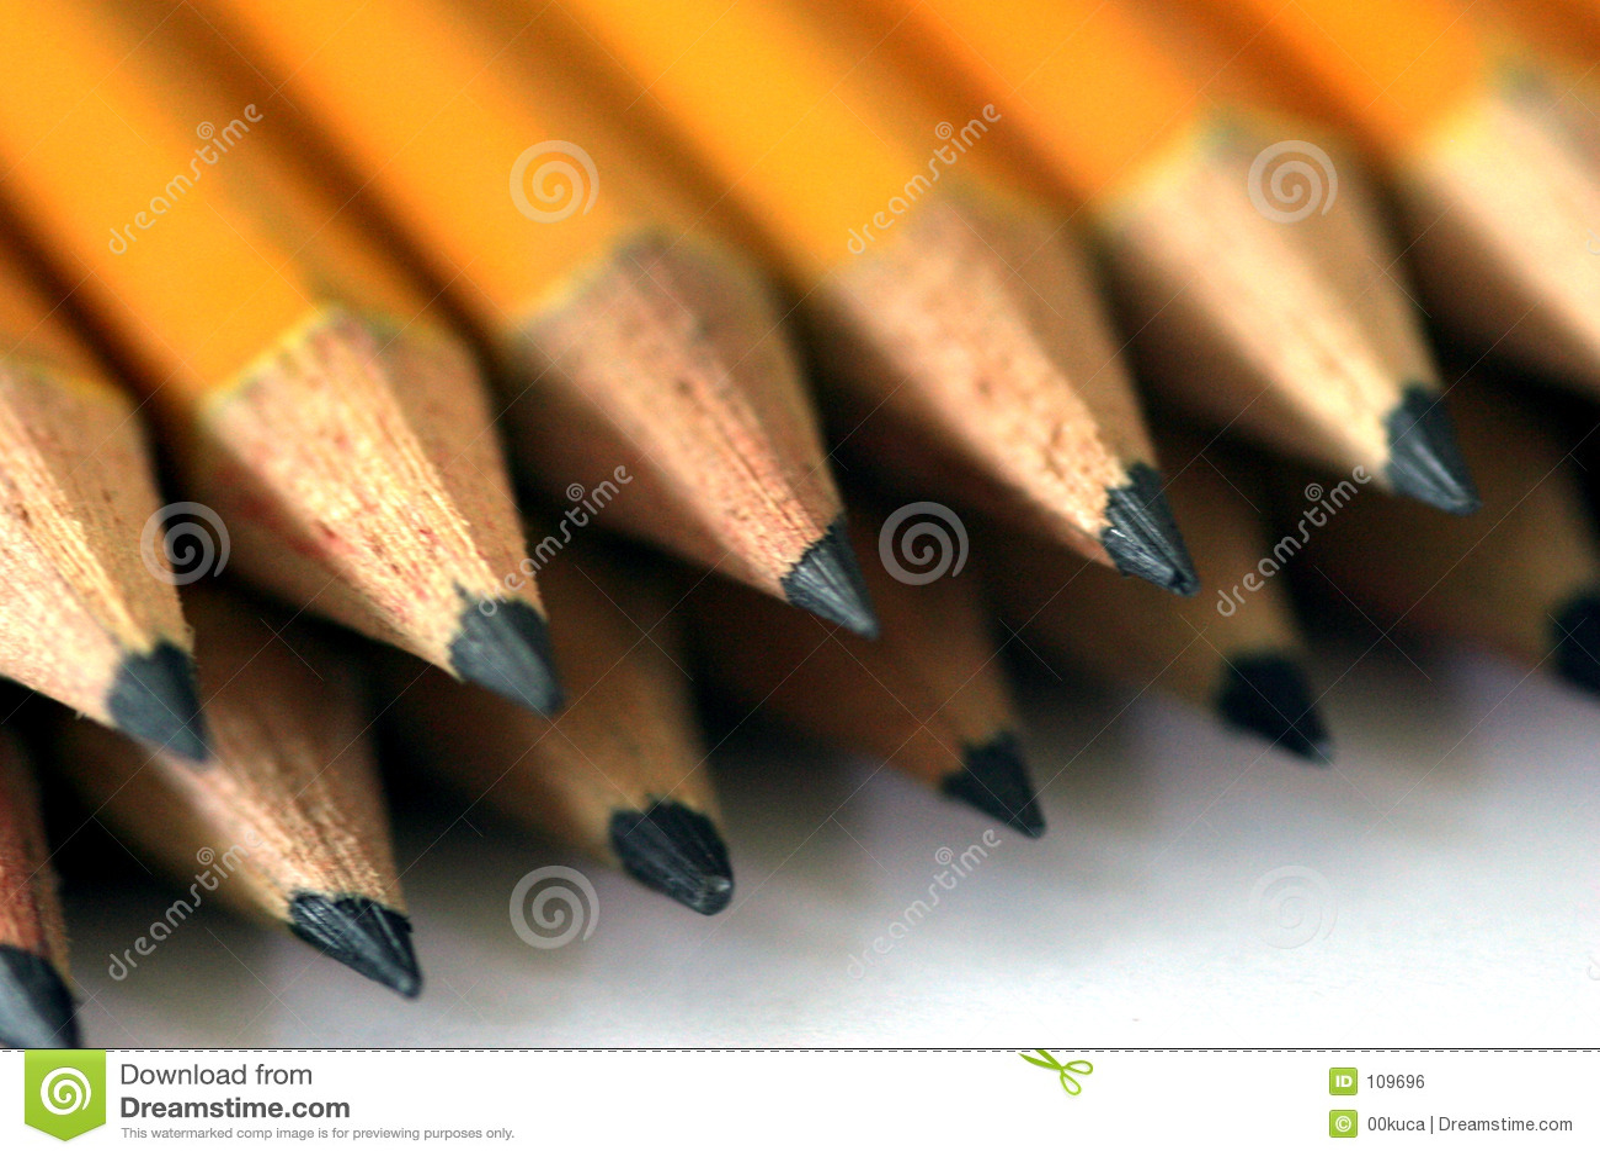 Download Just pencils stock photo. Image of tool, penclis, macro - 109696